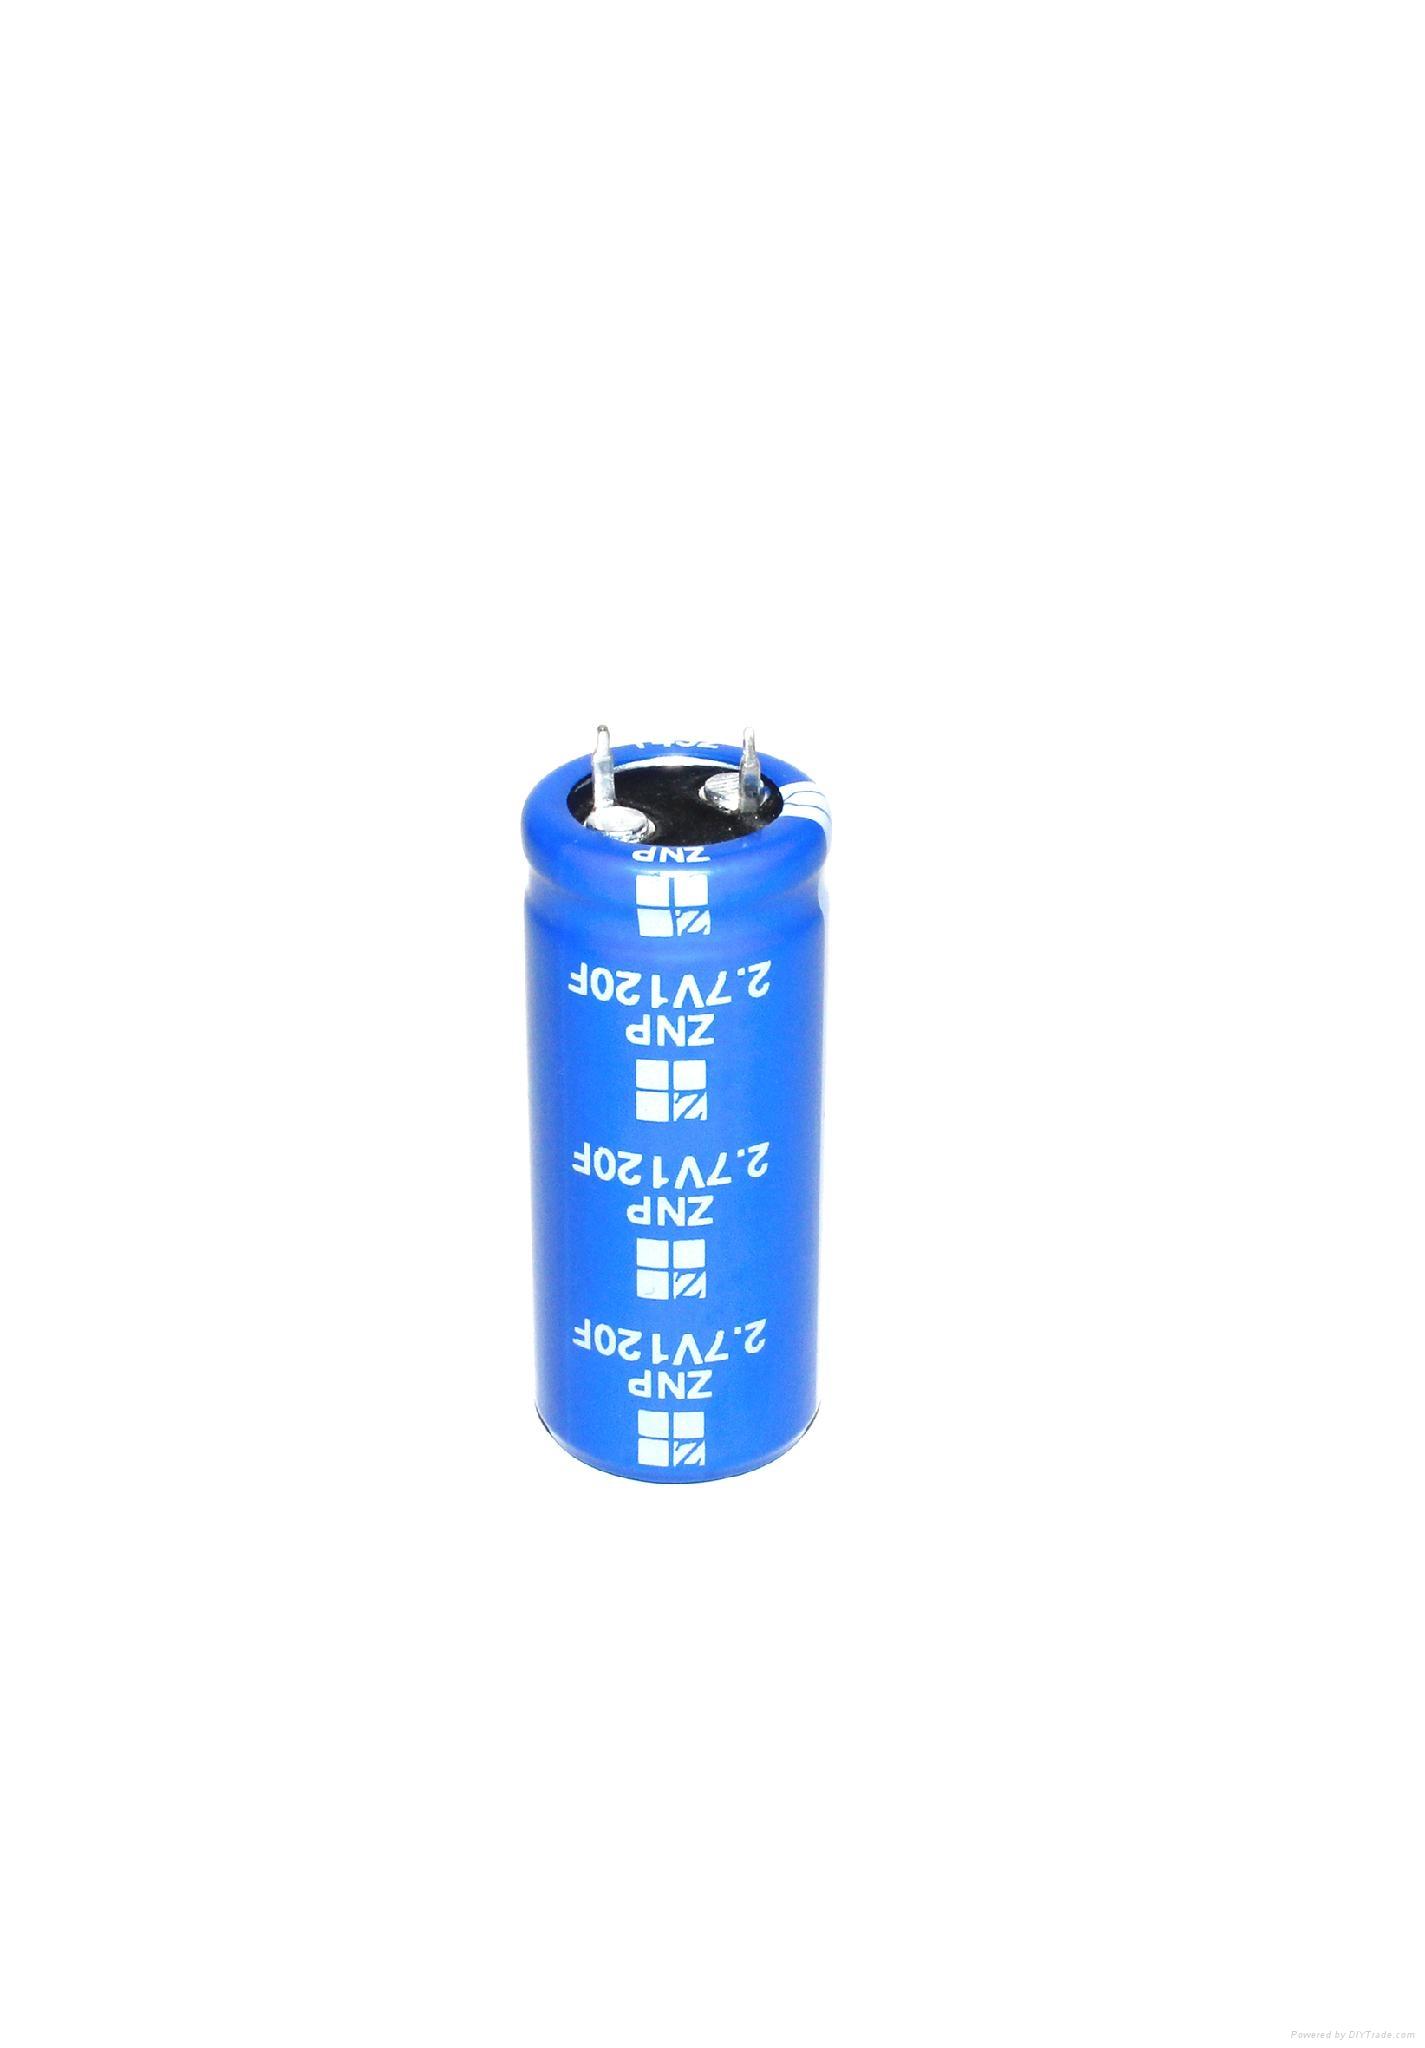 ultra capacitor 120f high power super capacitor EDLC 4